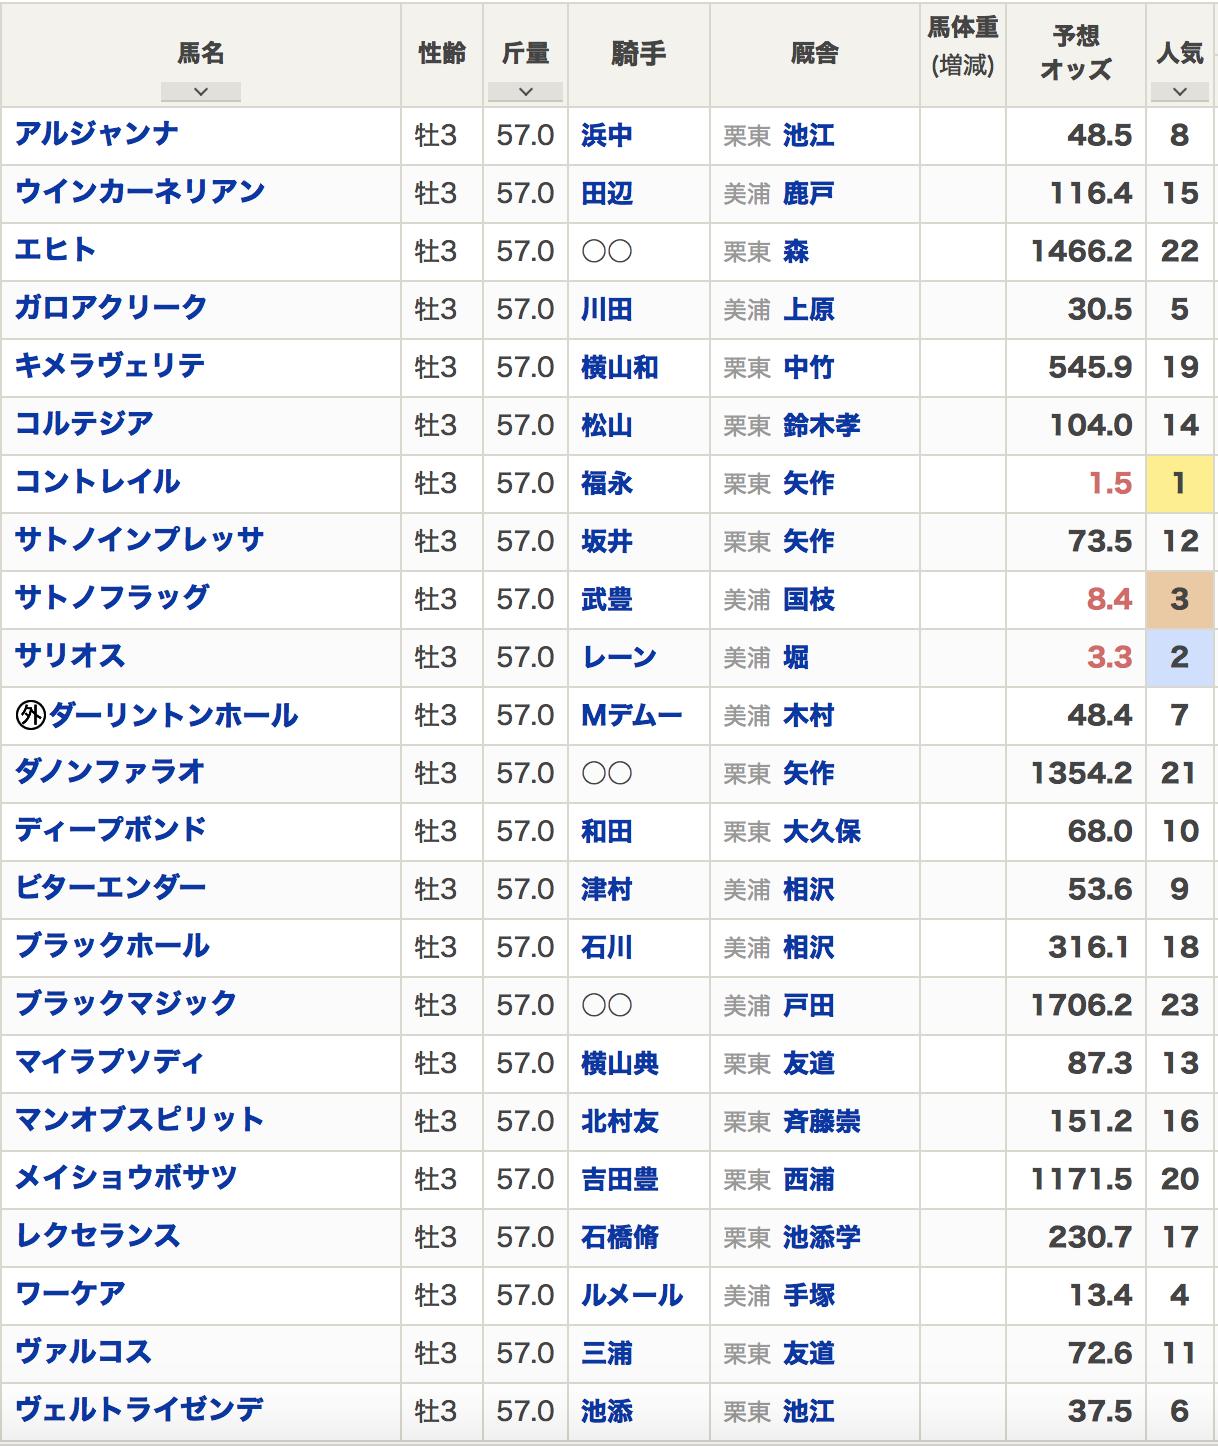 日本ダービー2020出走登録馬